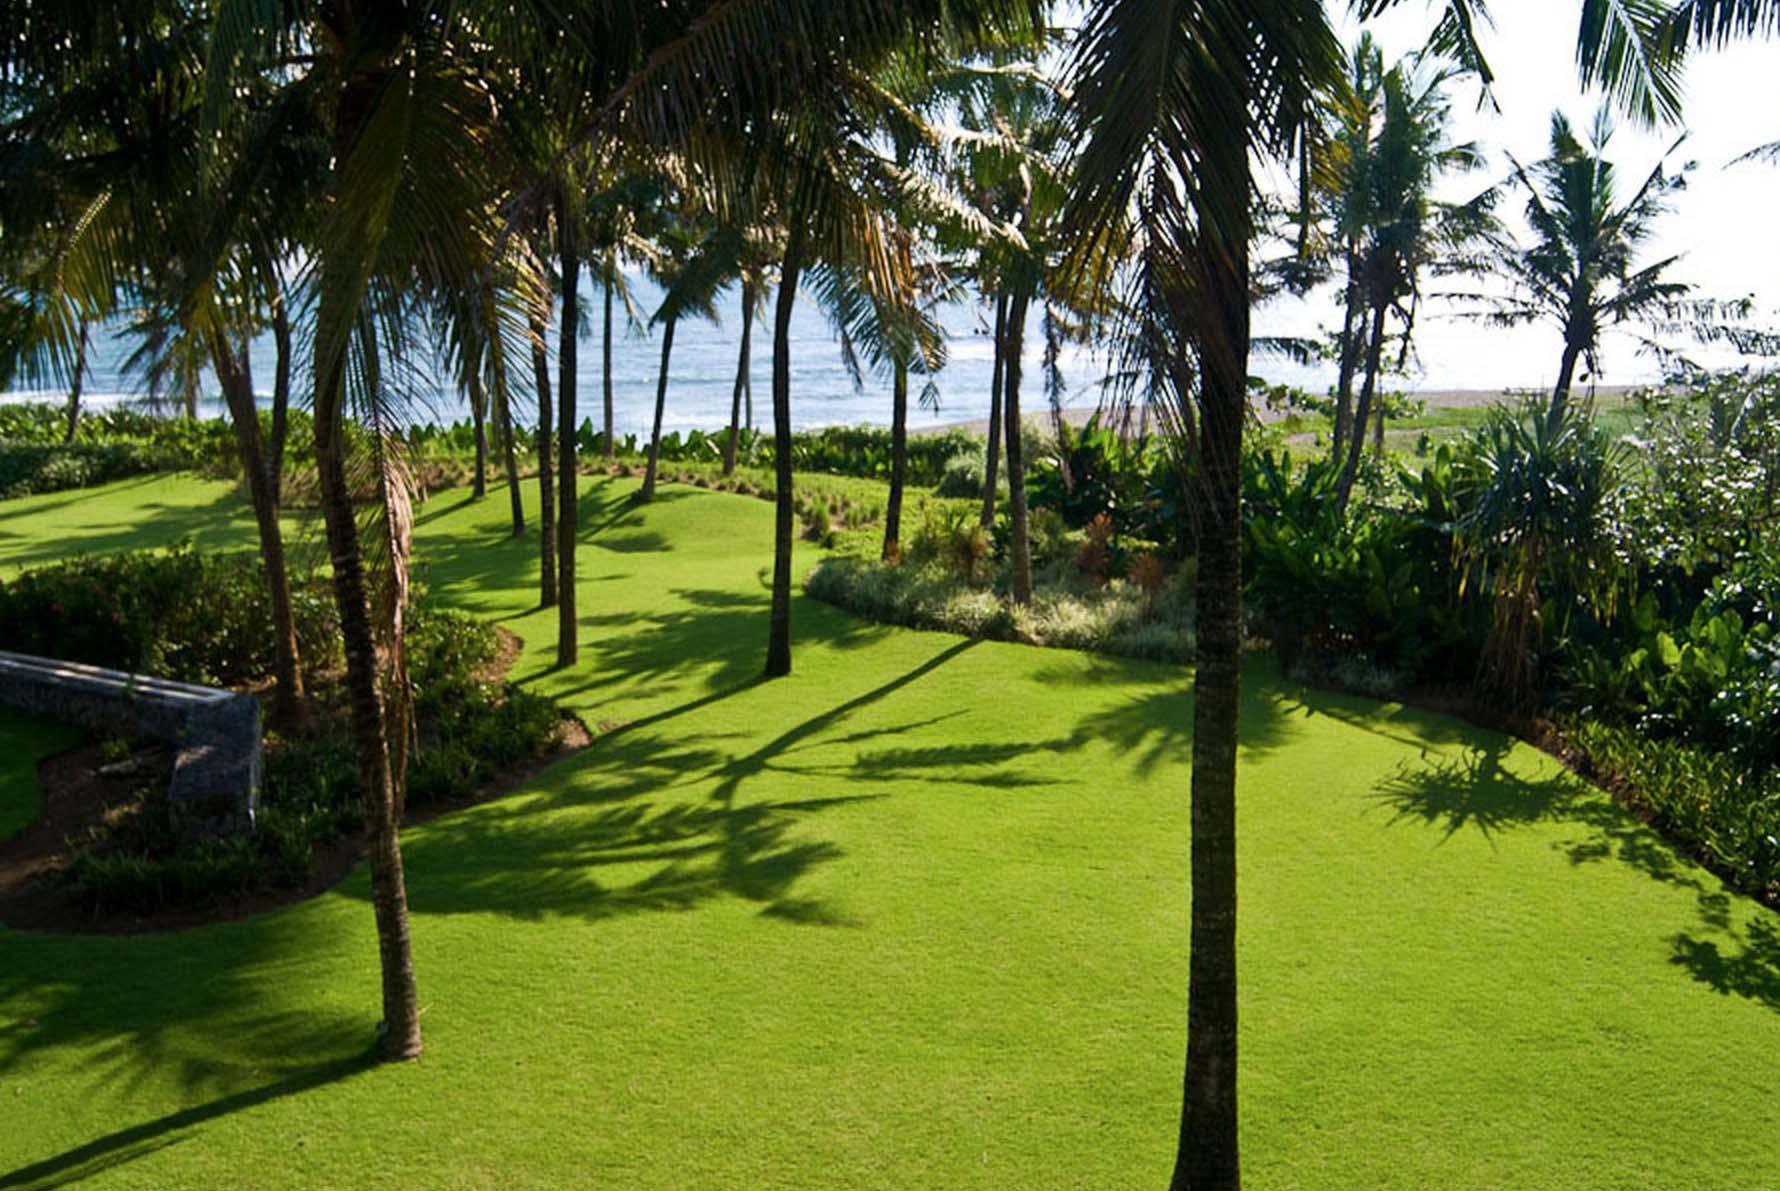 Villa Arika - 4-Bedroom Beachfront, Canggu, Bali | Ultimate Bali